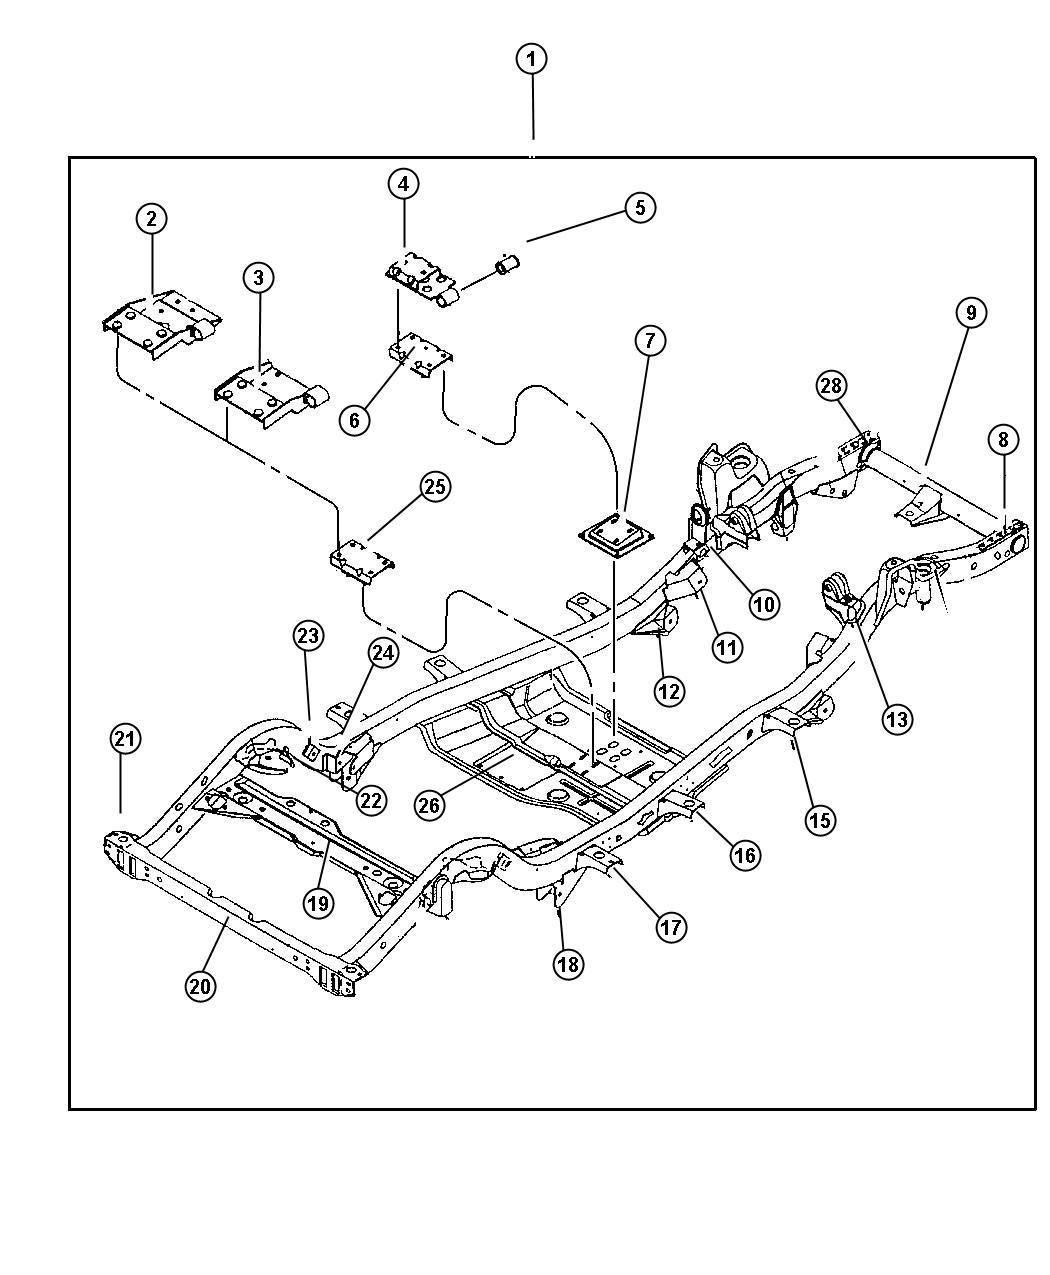 Dodge Durango Bushing. Exhaust hanger. [all 4/5 cyl turbo